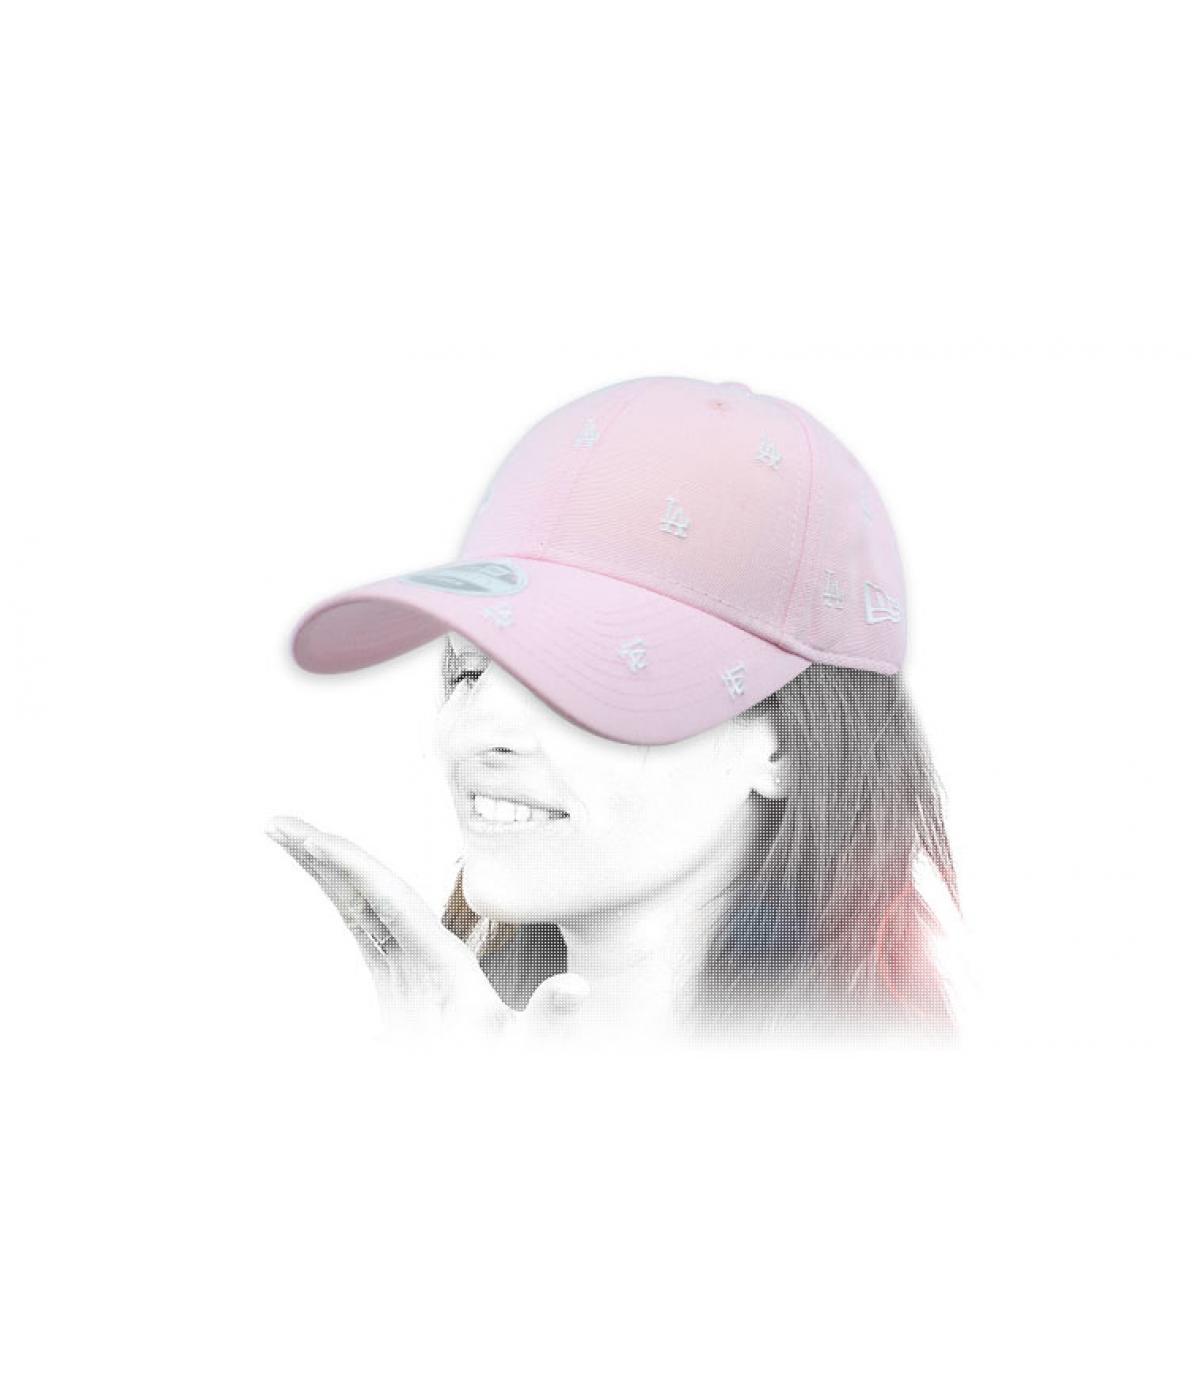 gorra mujer LA rosa monograma